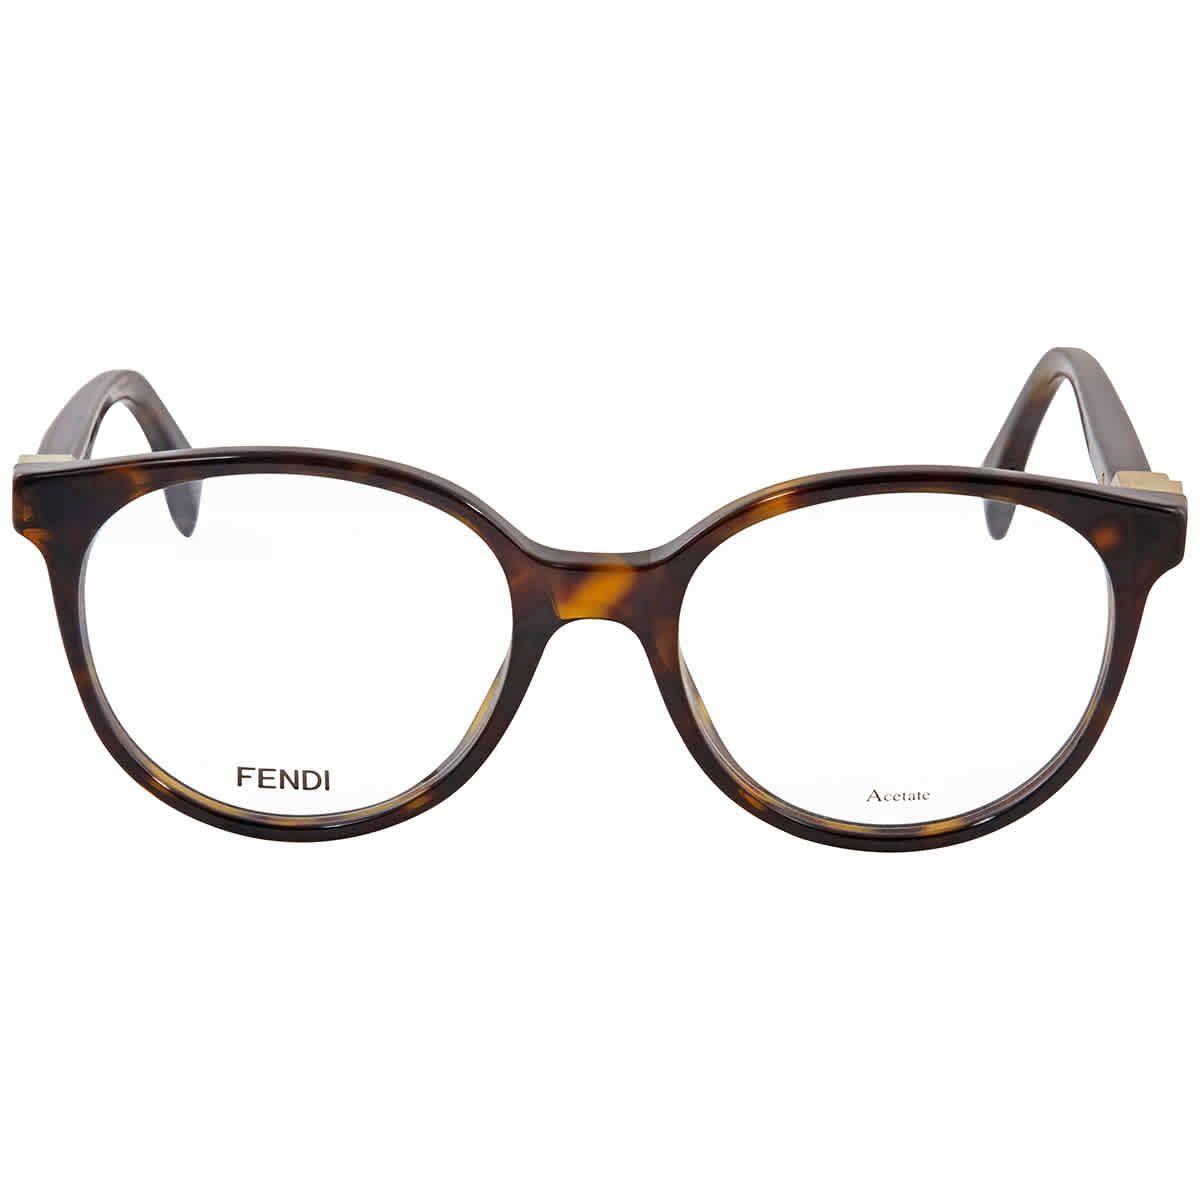 Fendi Eyeglasses. Color code: 086. Lens Width: 50 mm. Lens Bridge: 18 mm. Arm Length: 140 mm. Frame Color: Dark Havana. Frame Material; Acetate. Shape: Round. UPC/EAN code: 762753404756. Fendi Eyeglasses FF020208650.